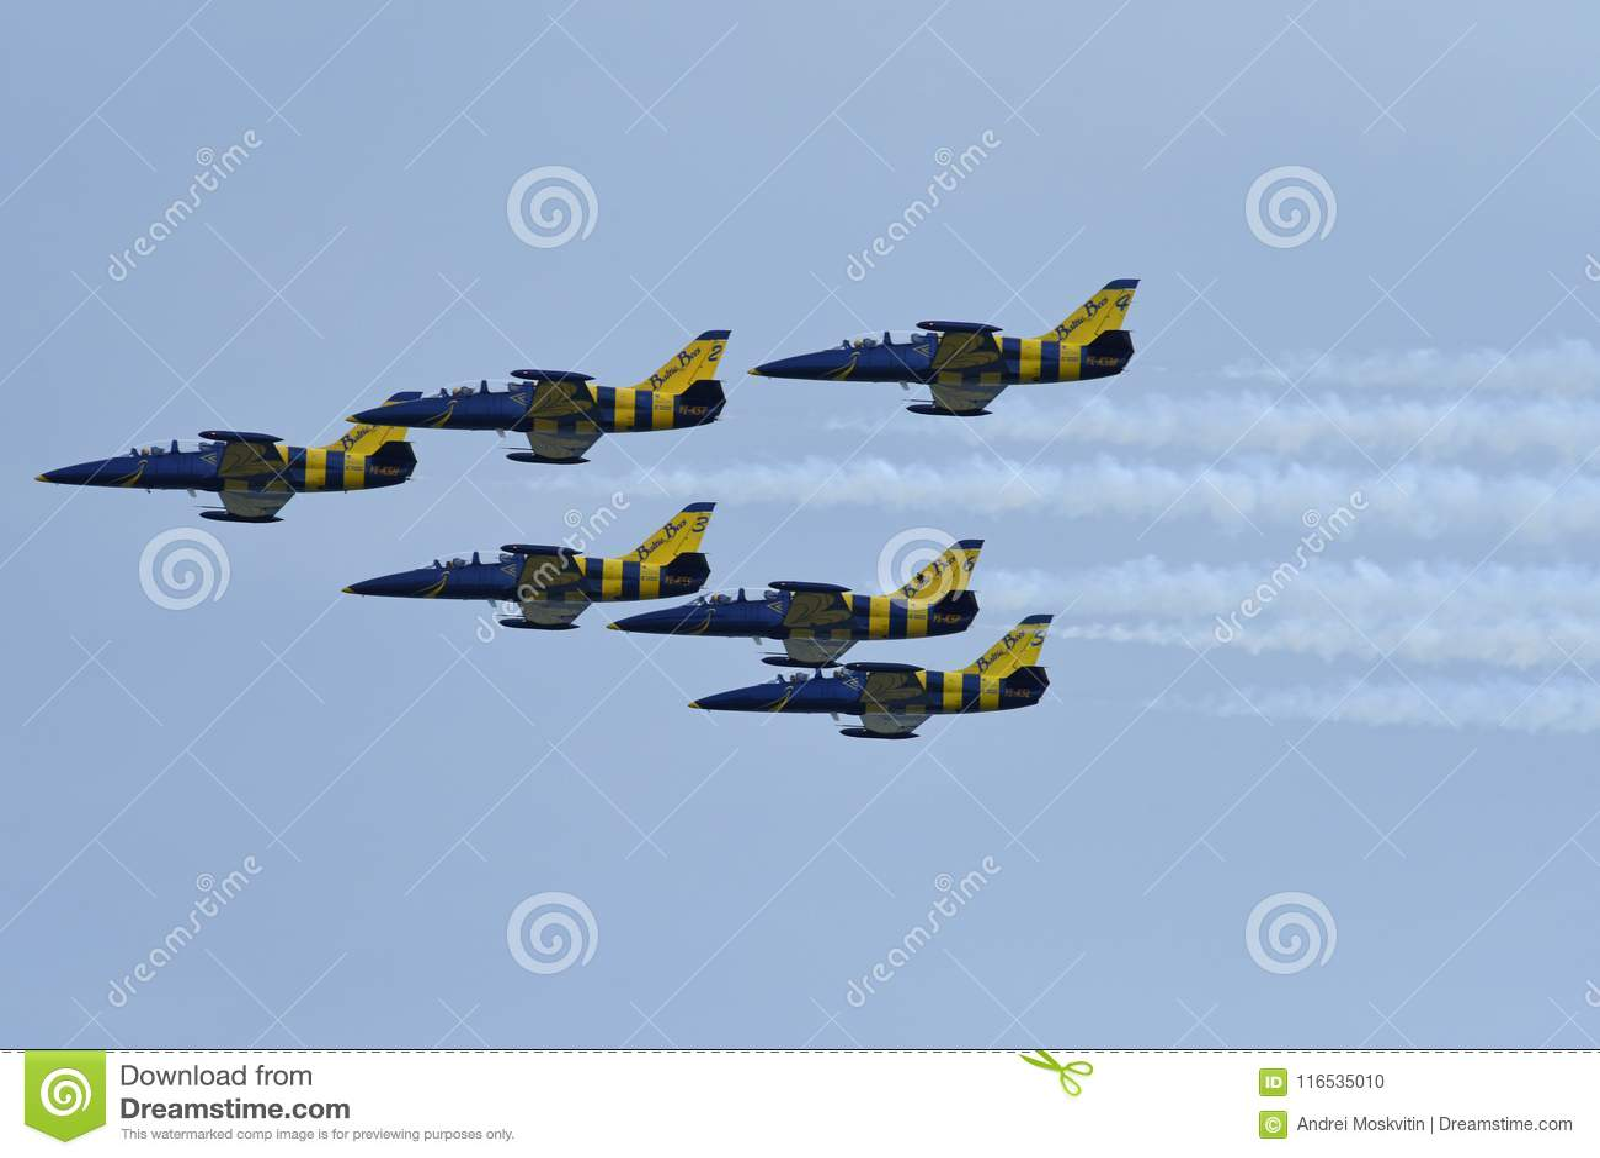 BeautifBeautiful vliegende aircraftul vliegende vliegtuigen